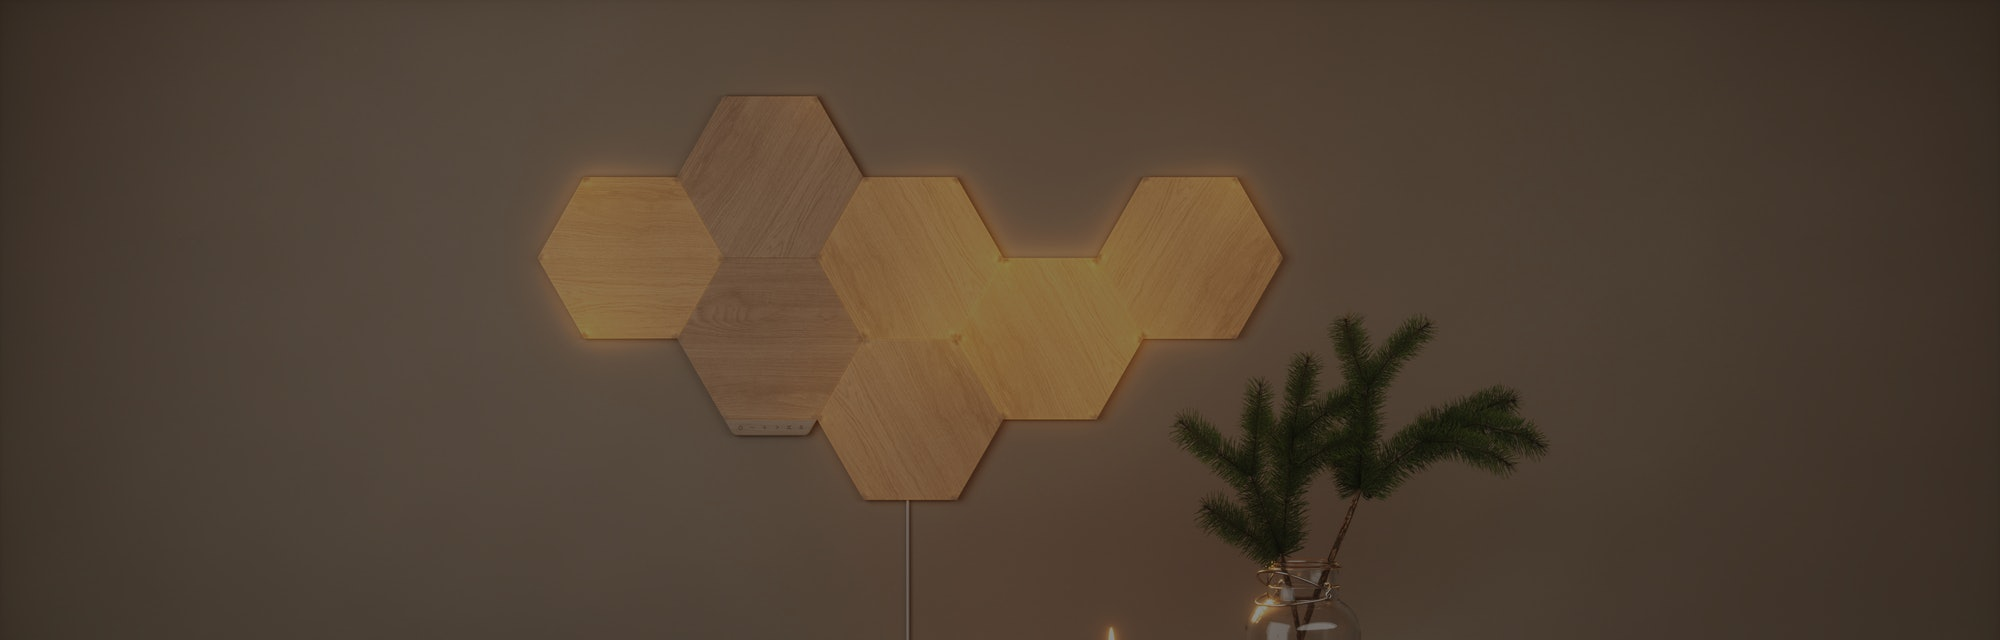 Nanoleaf Elements panels